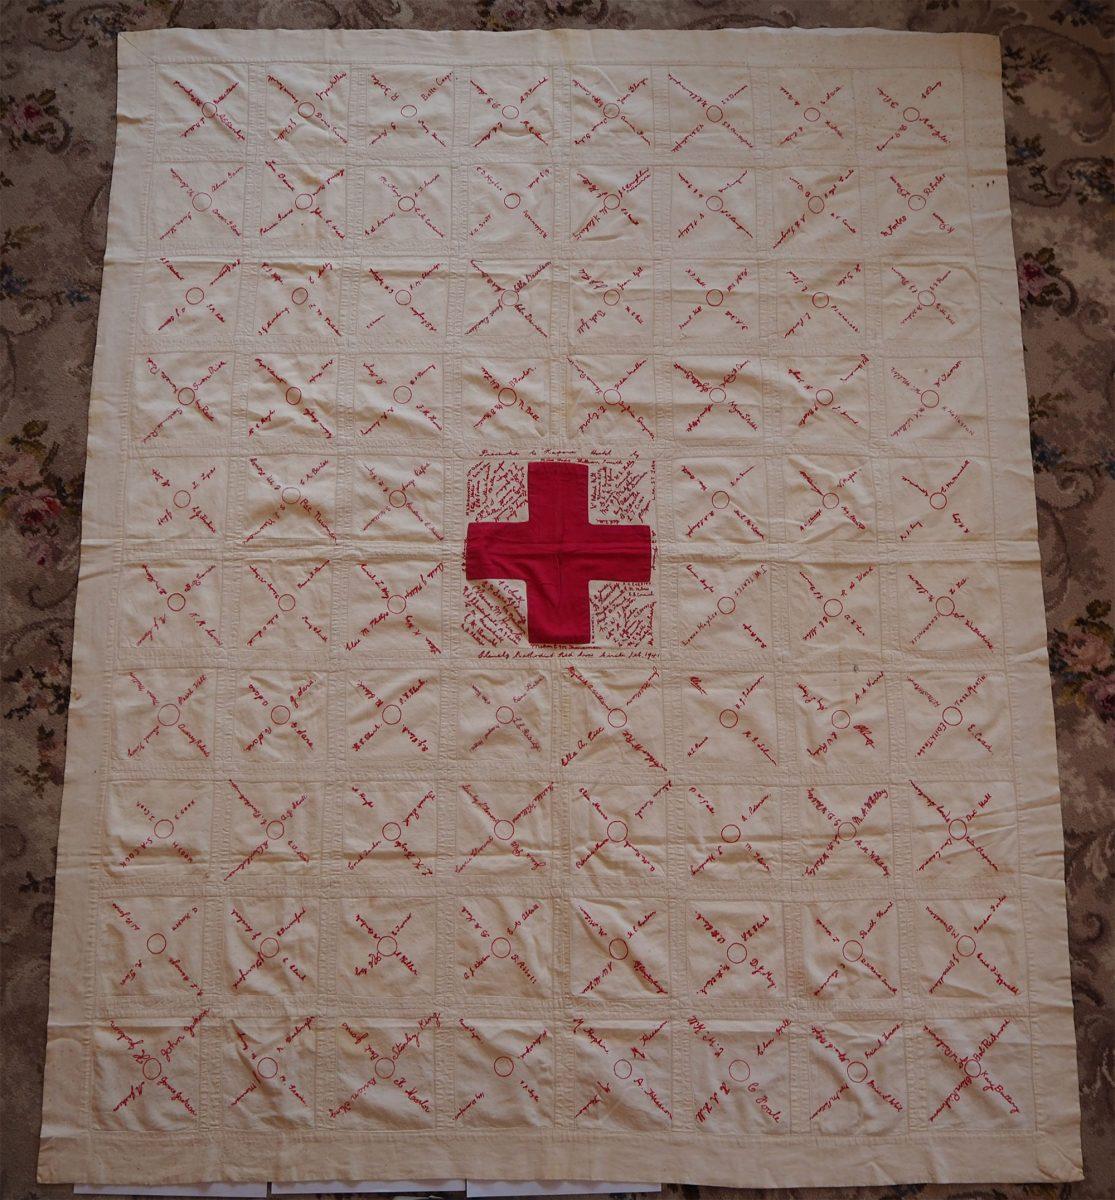 Red Cross. Glenelg Methodist Red Cross Circle 1941: Quilt